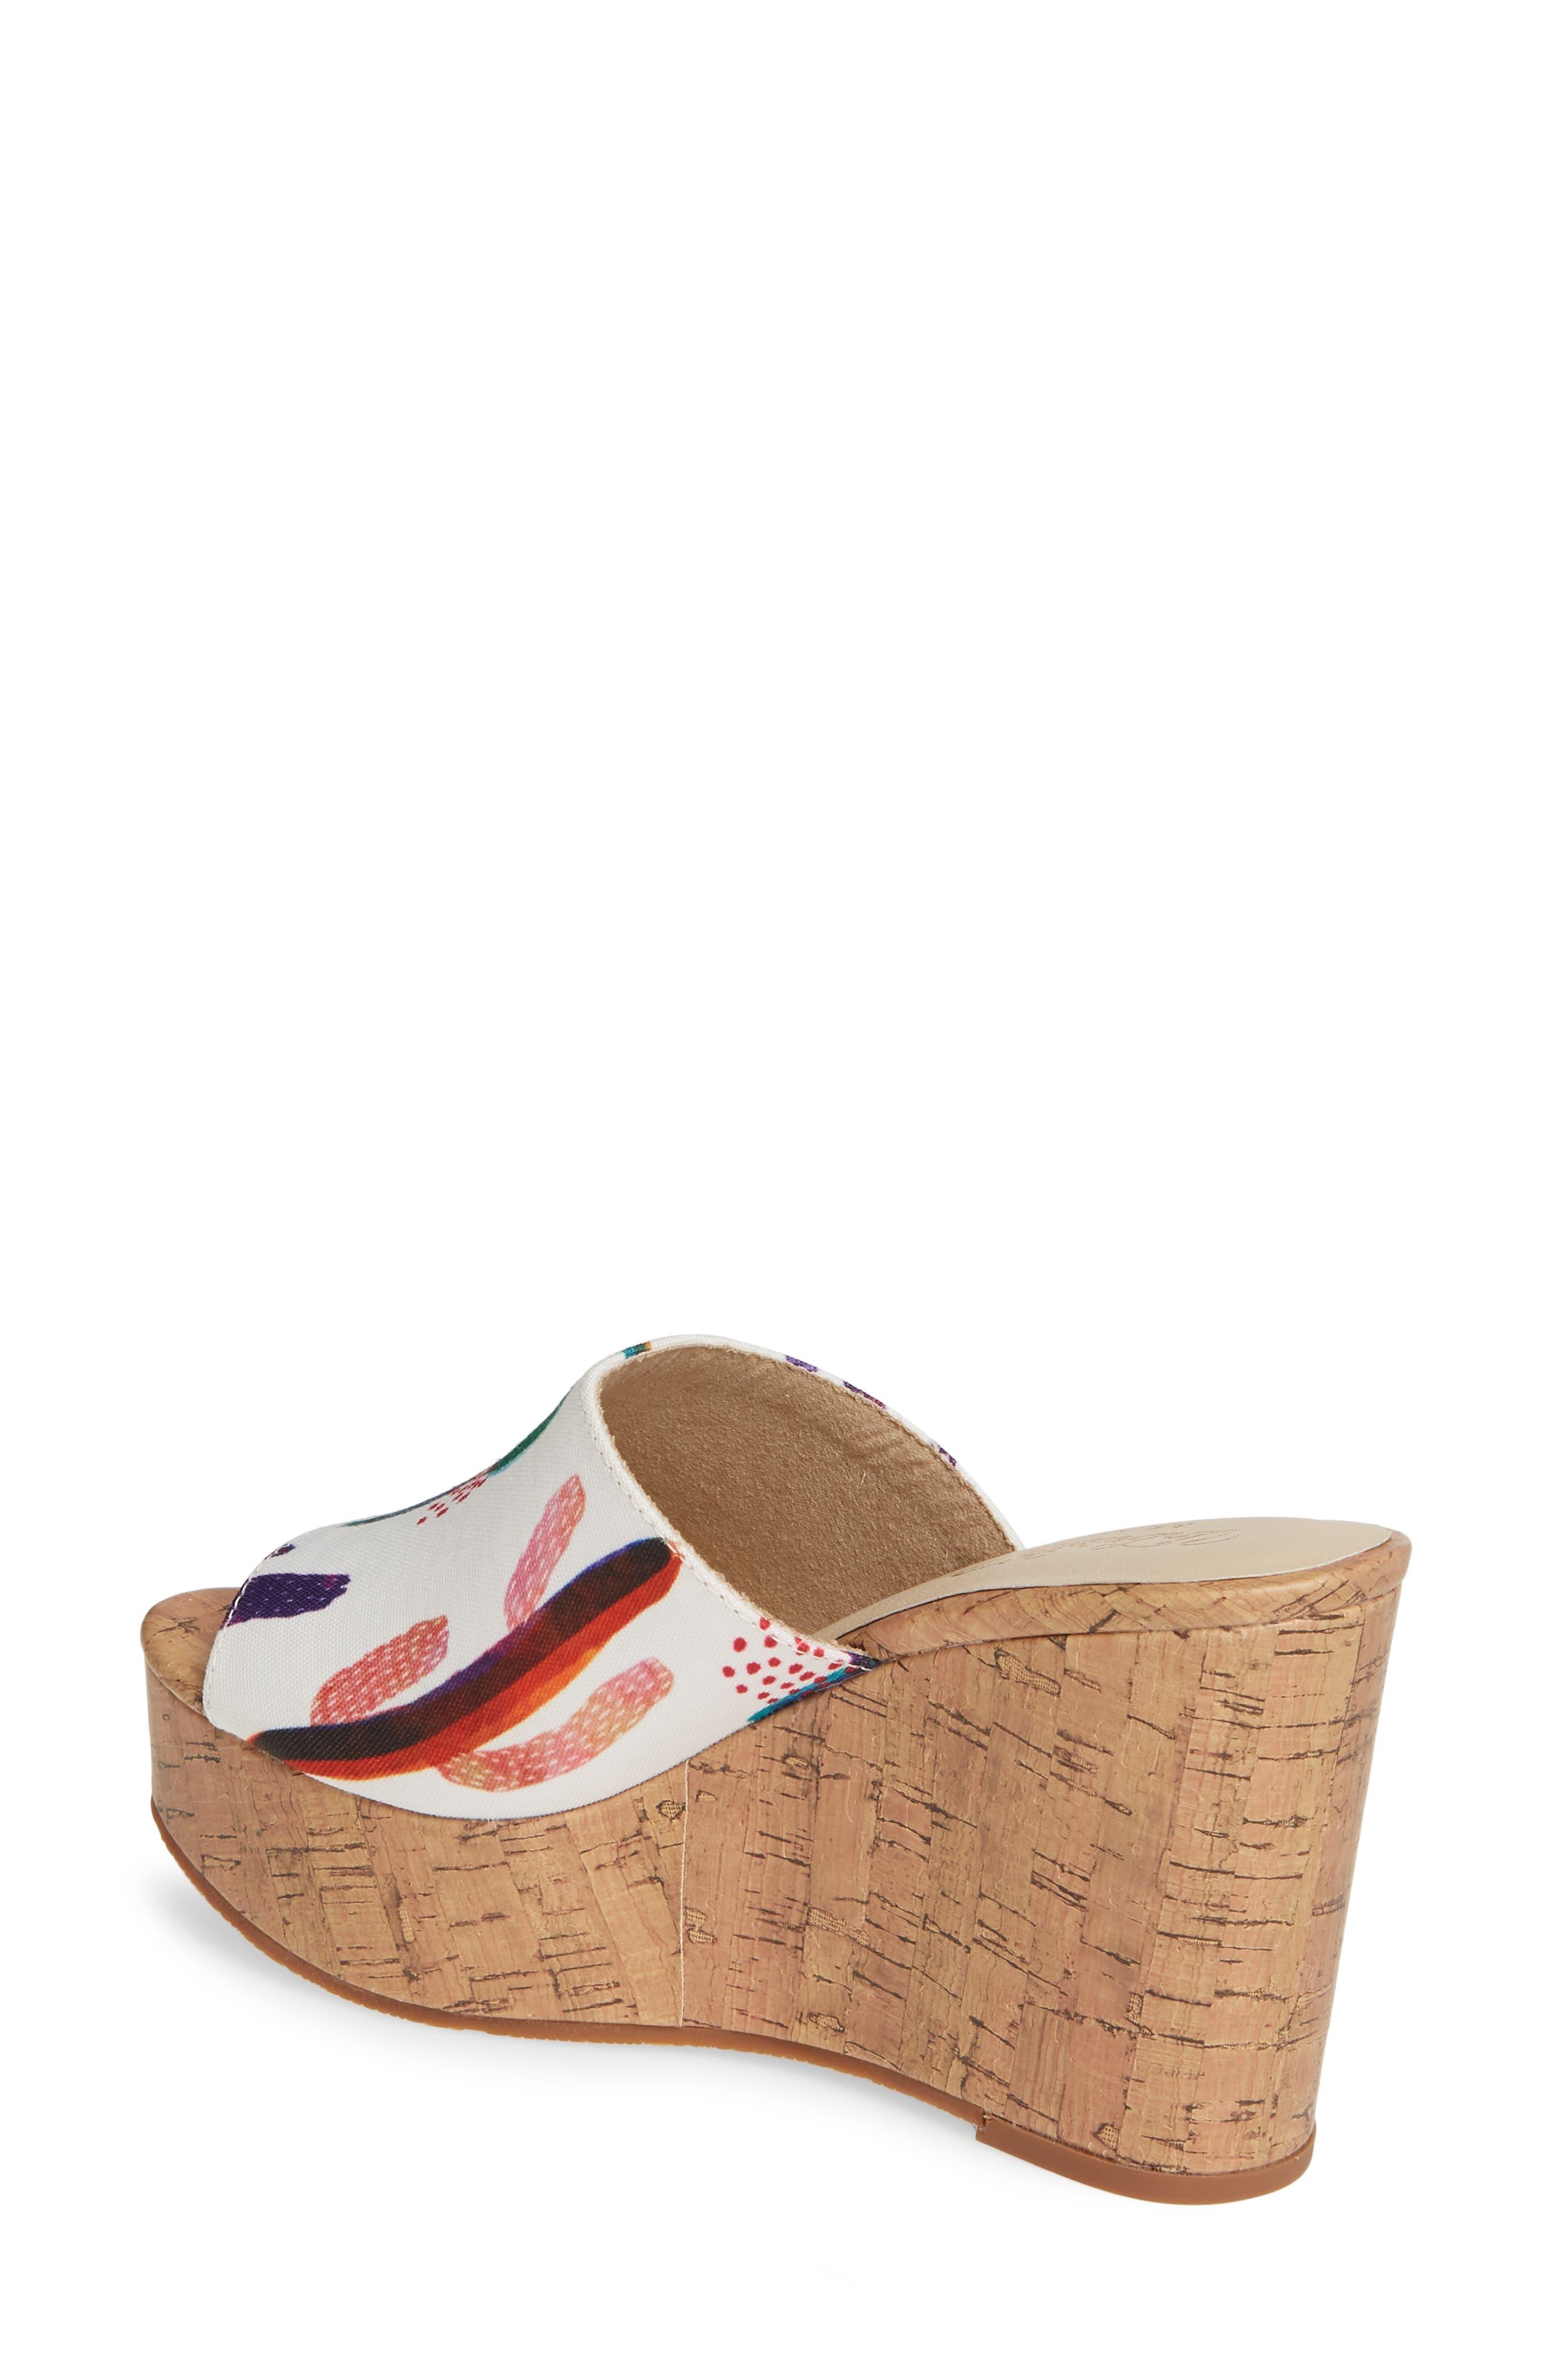 ARIAT, Layla Wedge Slide Sandal, Alternate thumbnail 2, color, CACTUS PRINT FABRIC